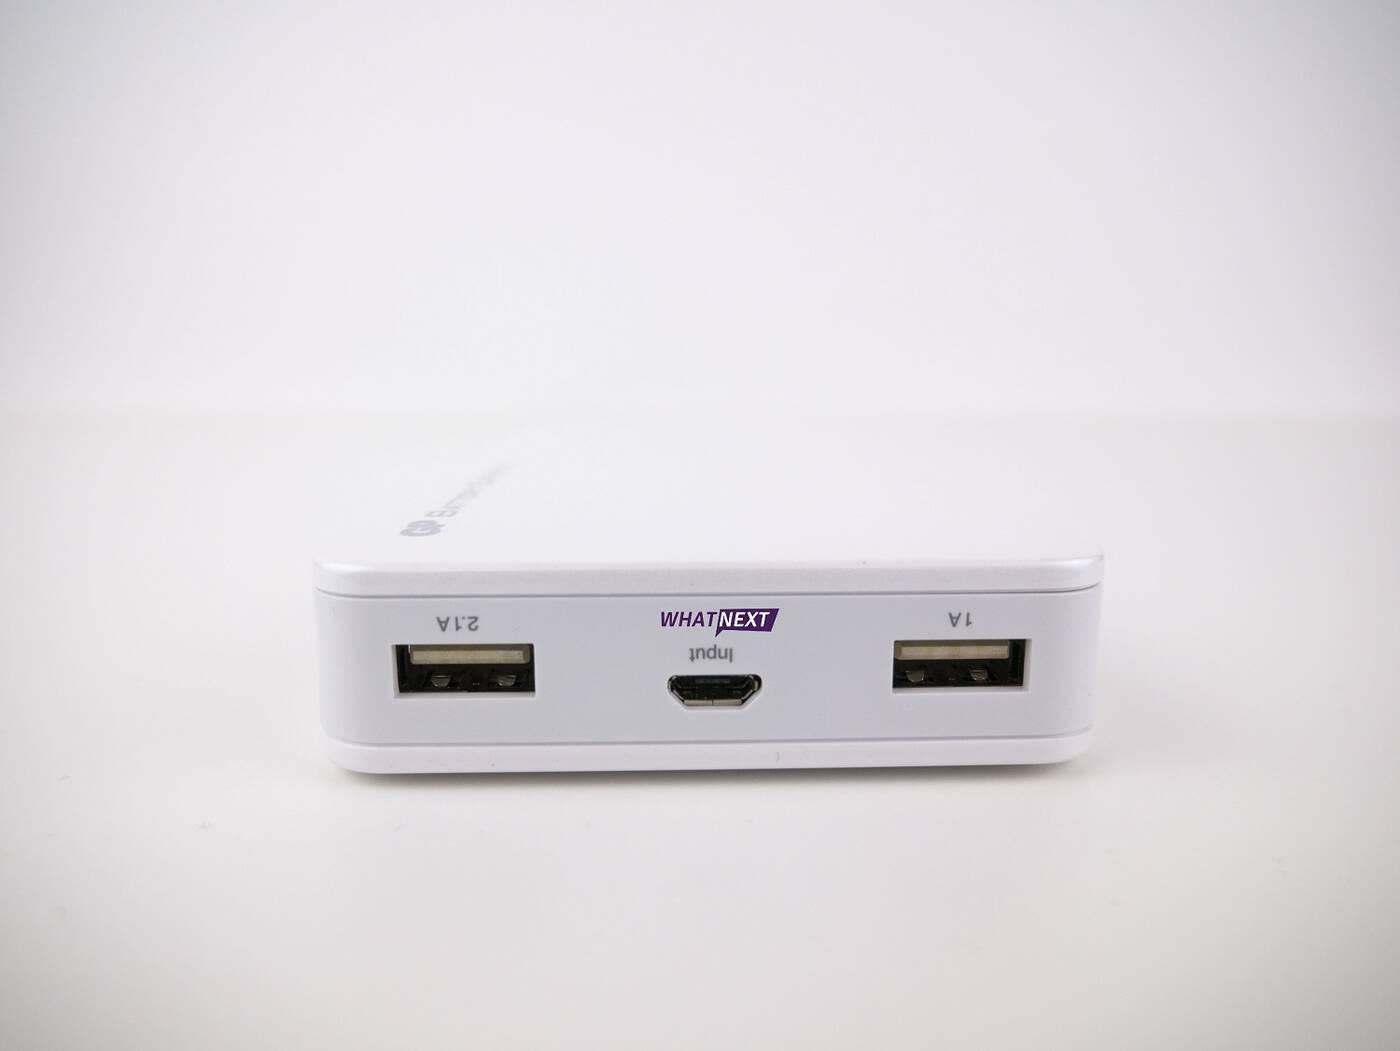 test gp portable powerbank 3c20a 20000 mah. Black Bedroom Furniture Sets. Home Design Ideas